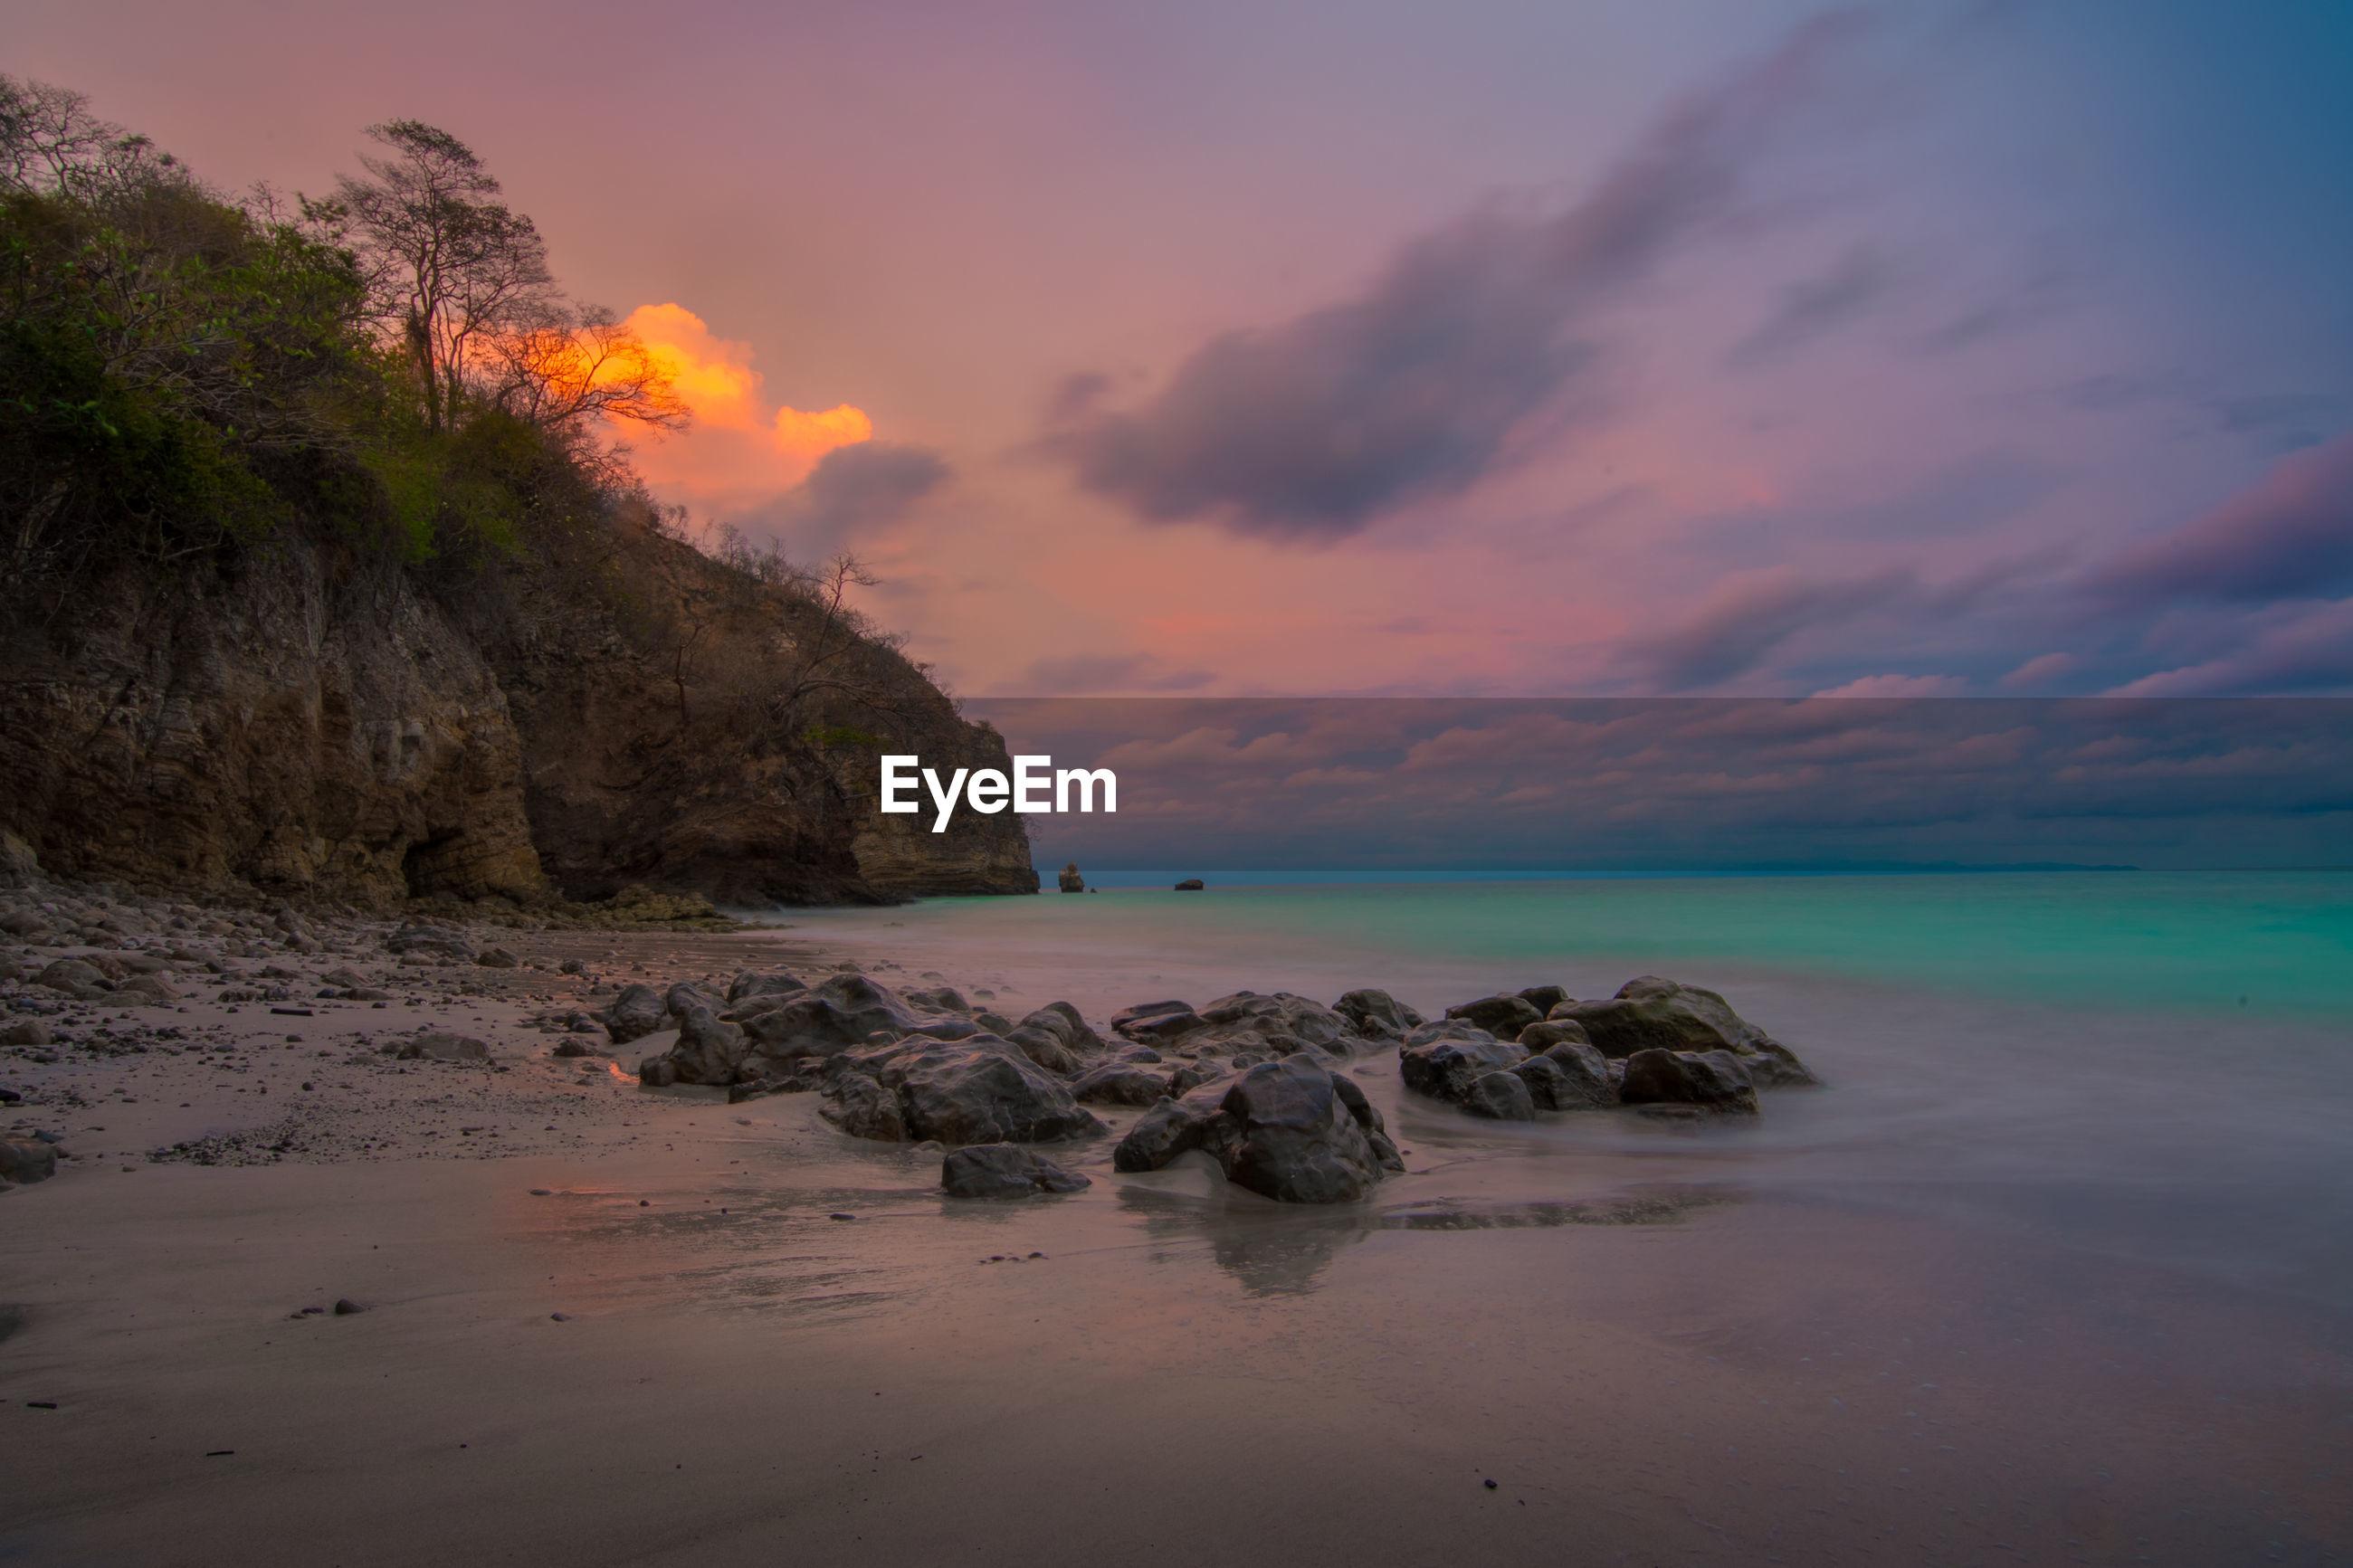 ROCKS ON BEACH AGAINST SKY AT SUNSET